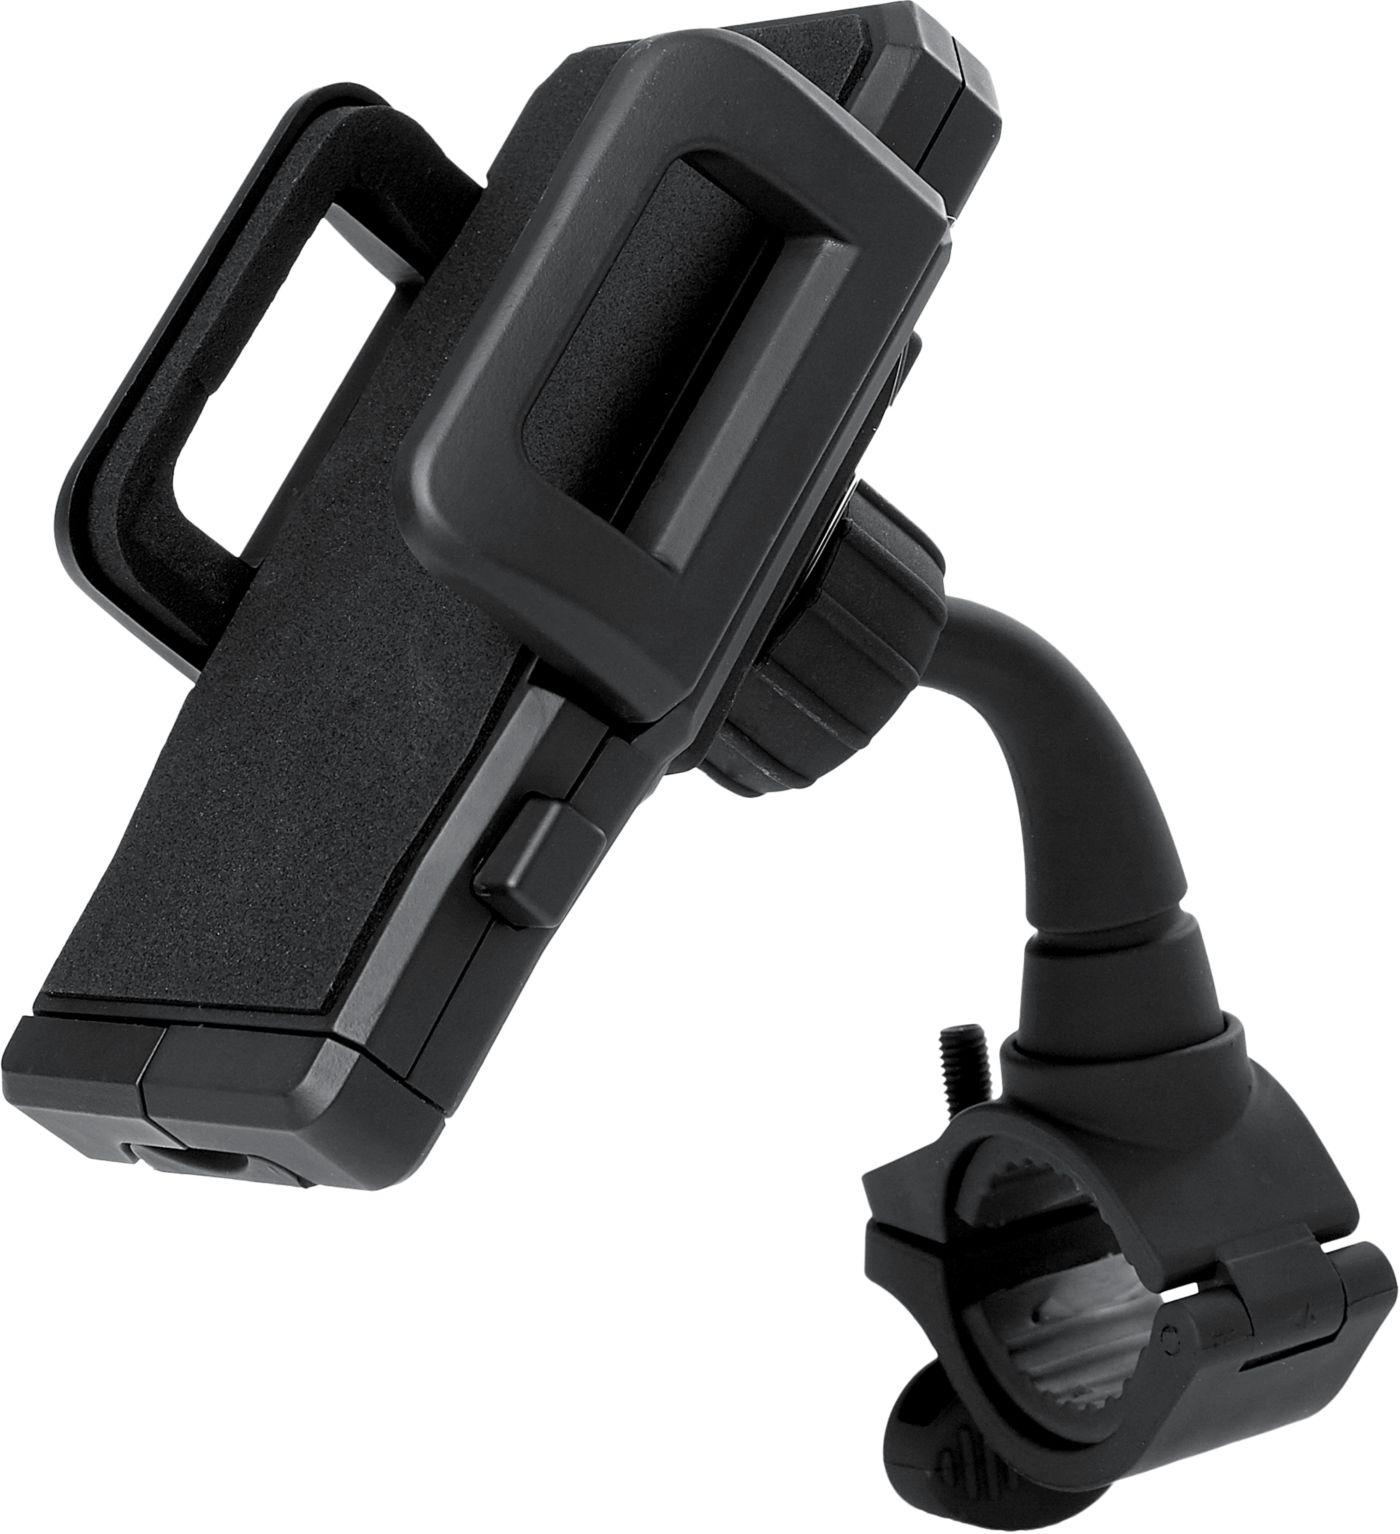 Maxfli 360 Phone/GPS Mount